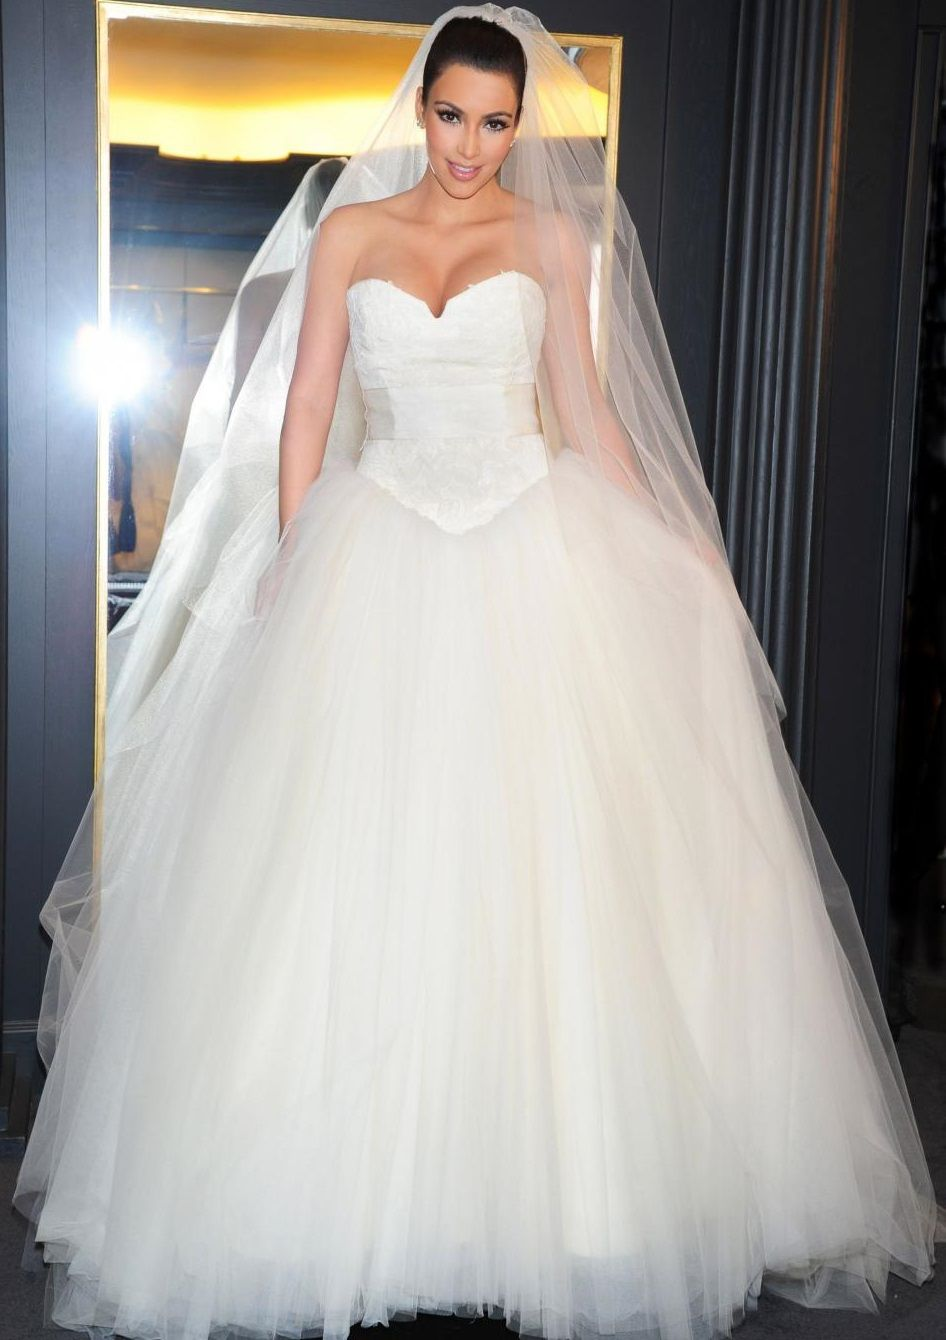 Wedding Dresses Online, Buy Cheap Wedding Dresses For ...